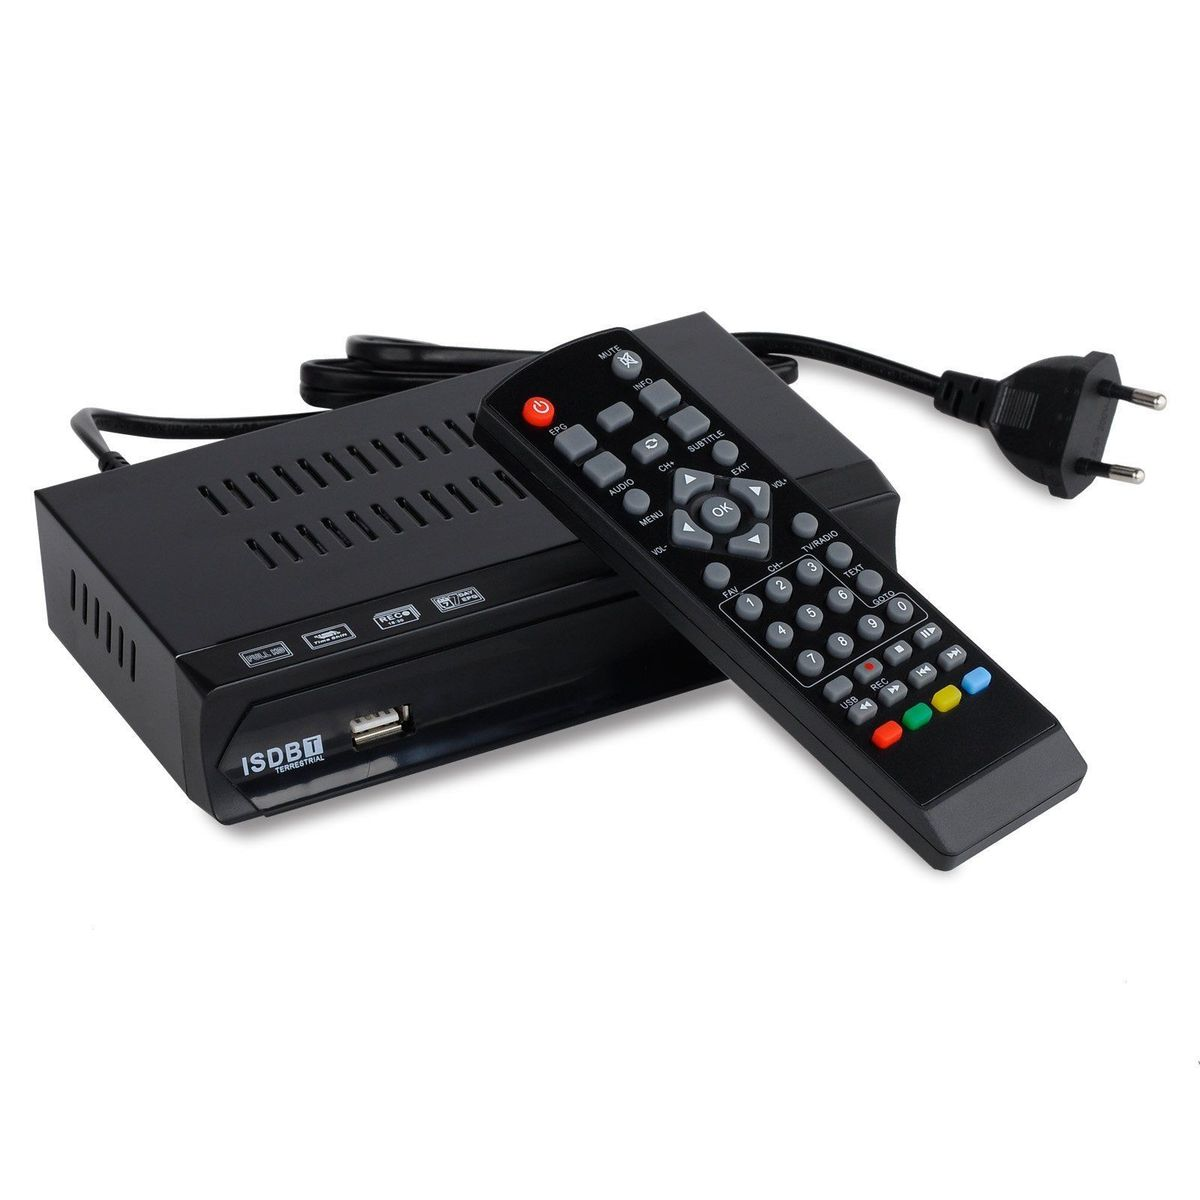 FTA Brasil Peru ISDB-T Sintonizador de TV Digital Terrestre Receptor Set Top Box Full HD 1080P Gravador USB EPG HDMI out VHF UHF Antena